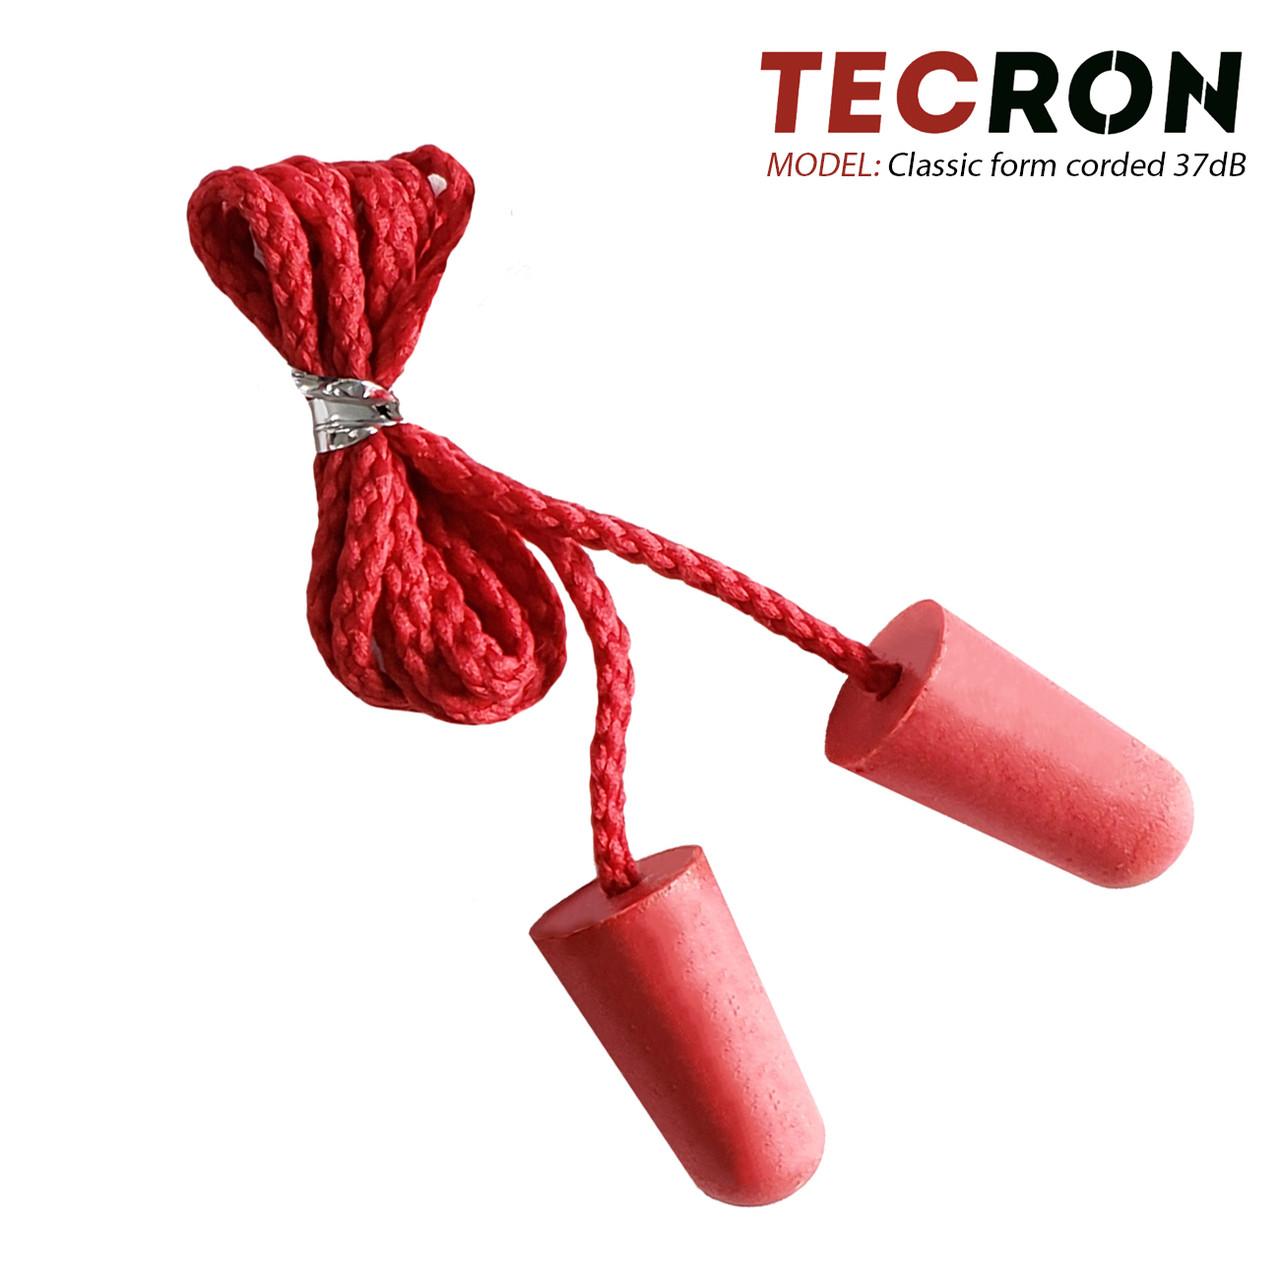 Беруши противошумные со шнурком TECRON Classic form corded 37dB